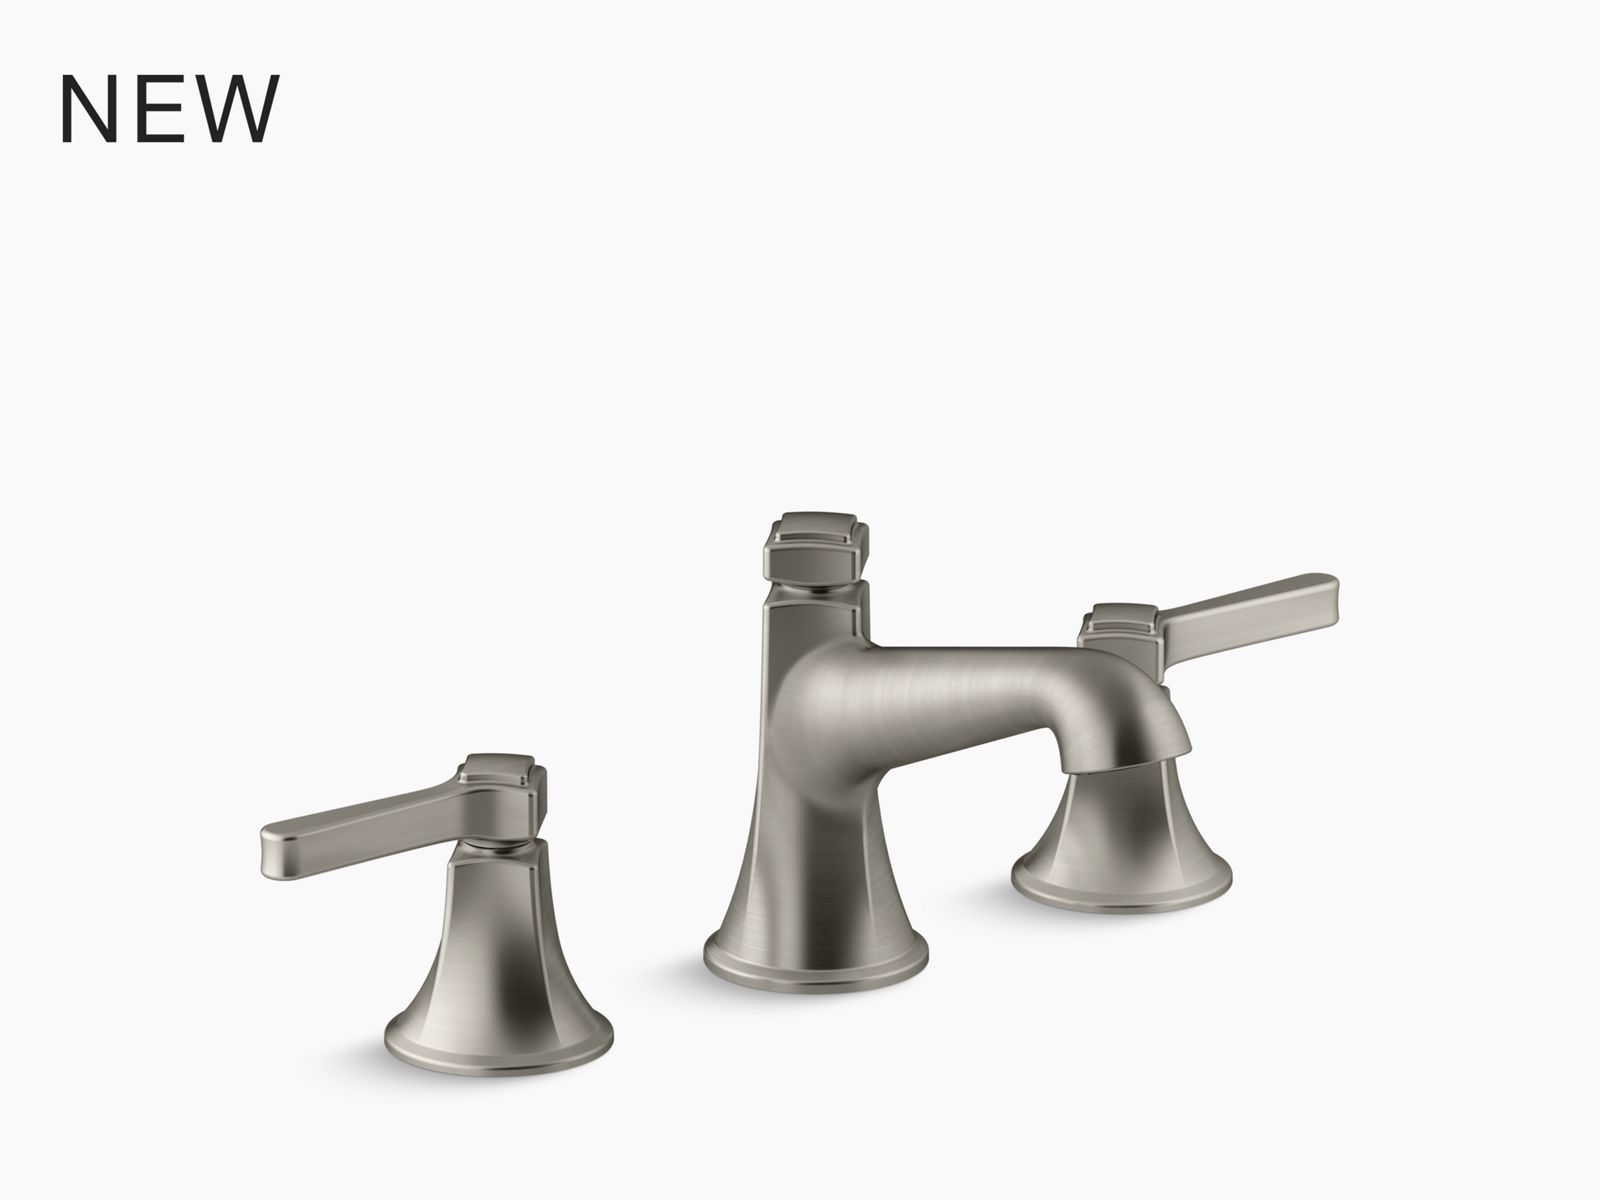 capilano pull down bridge kitchen faucet with soap lotion dispenser